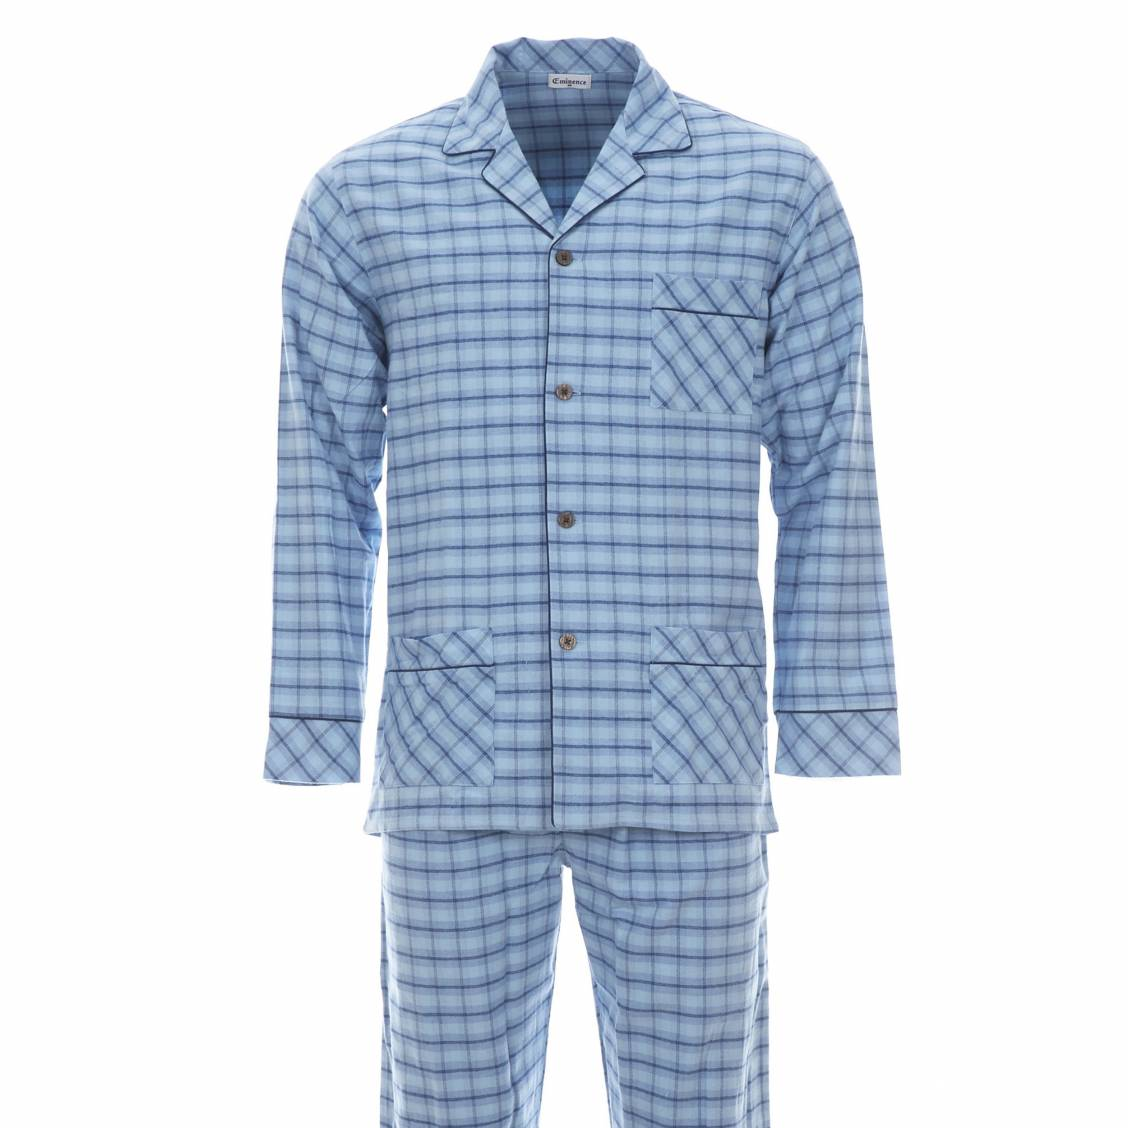 Pyjama chaud eminence veste boutonn e et pantalon 100 for Pyjama homme chaud